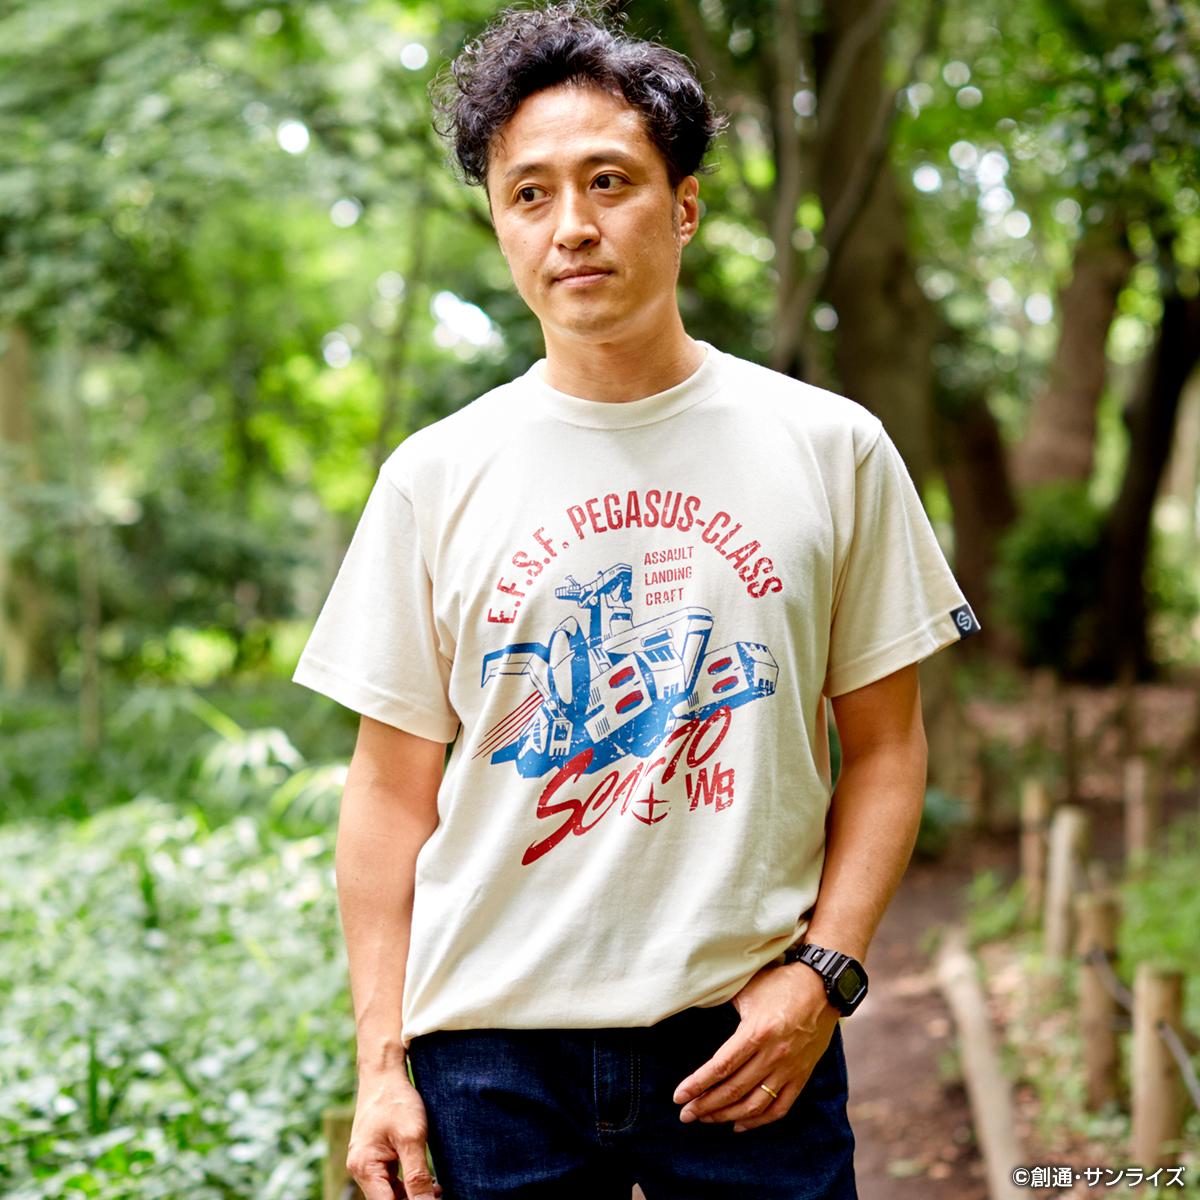 White Base T-shirt—Mobile Suit Gundam/STRICT-G Collaboration